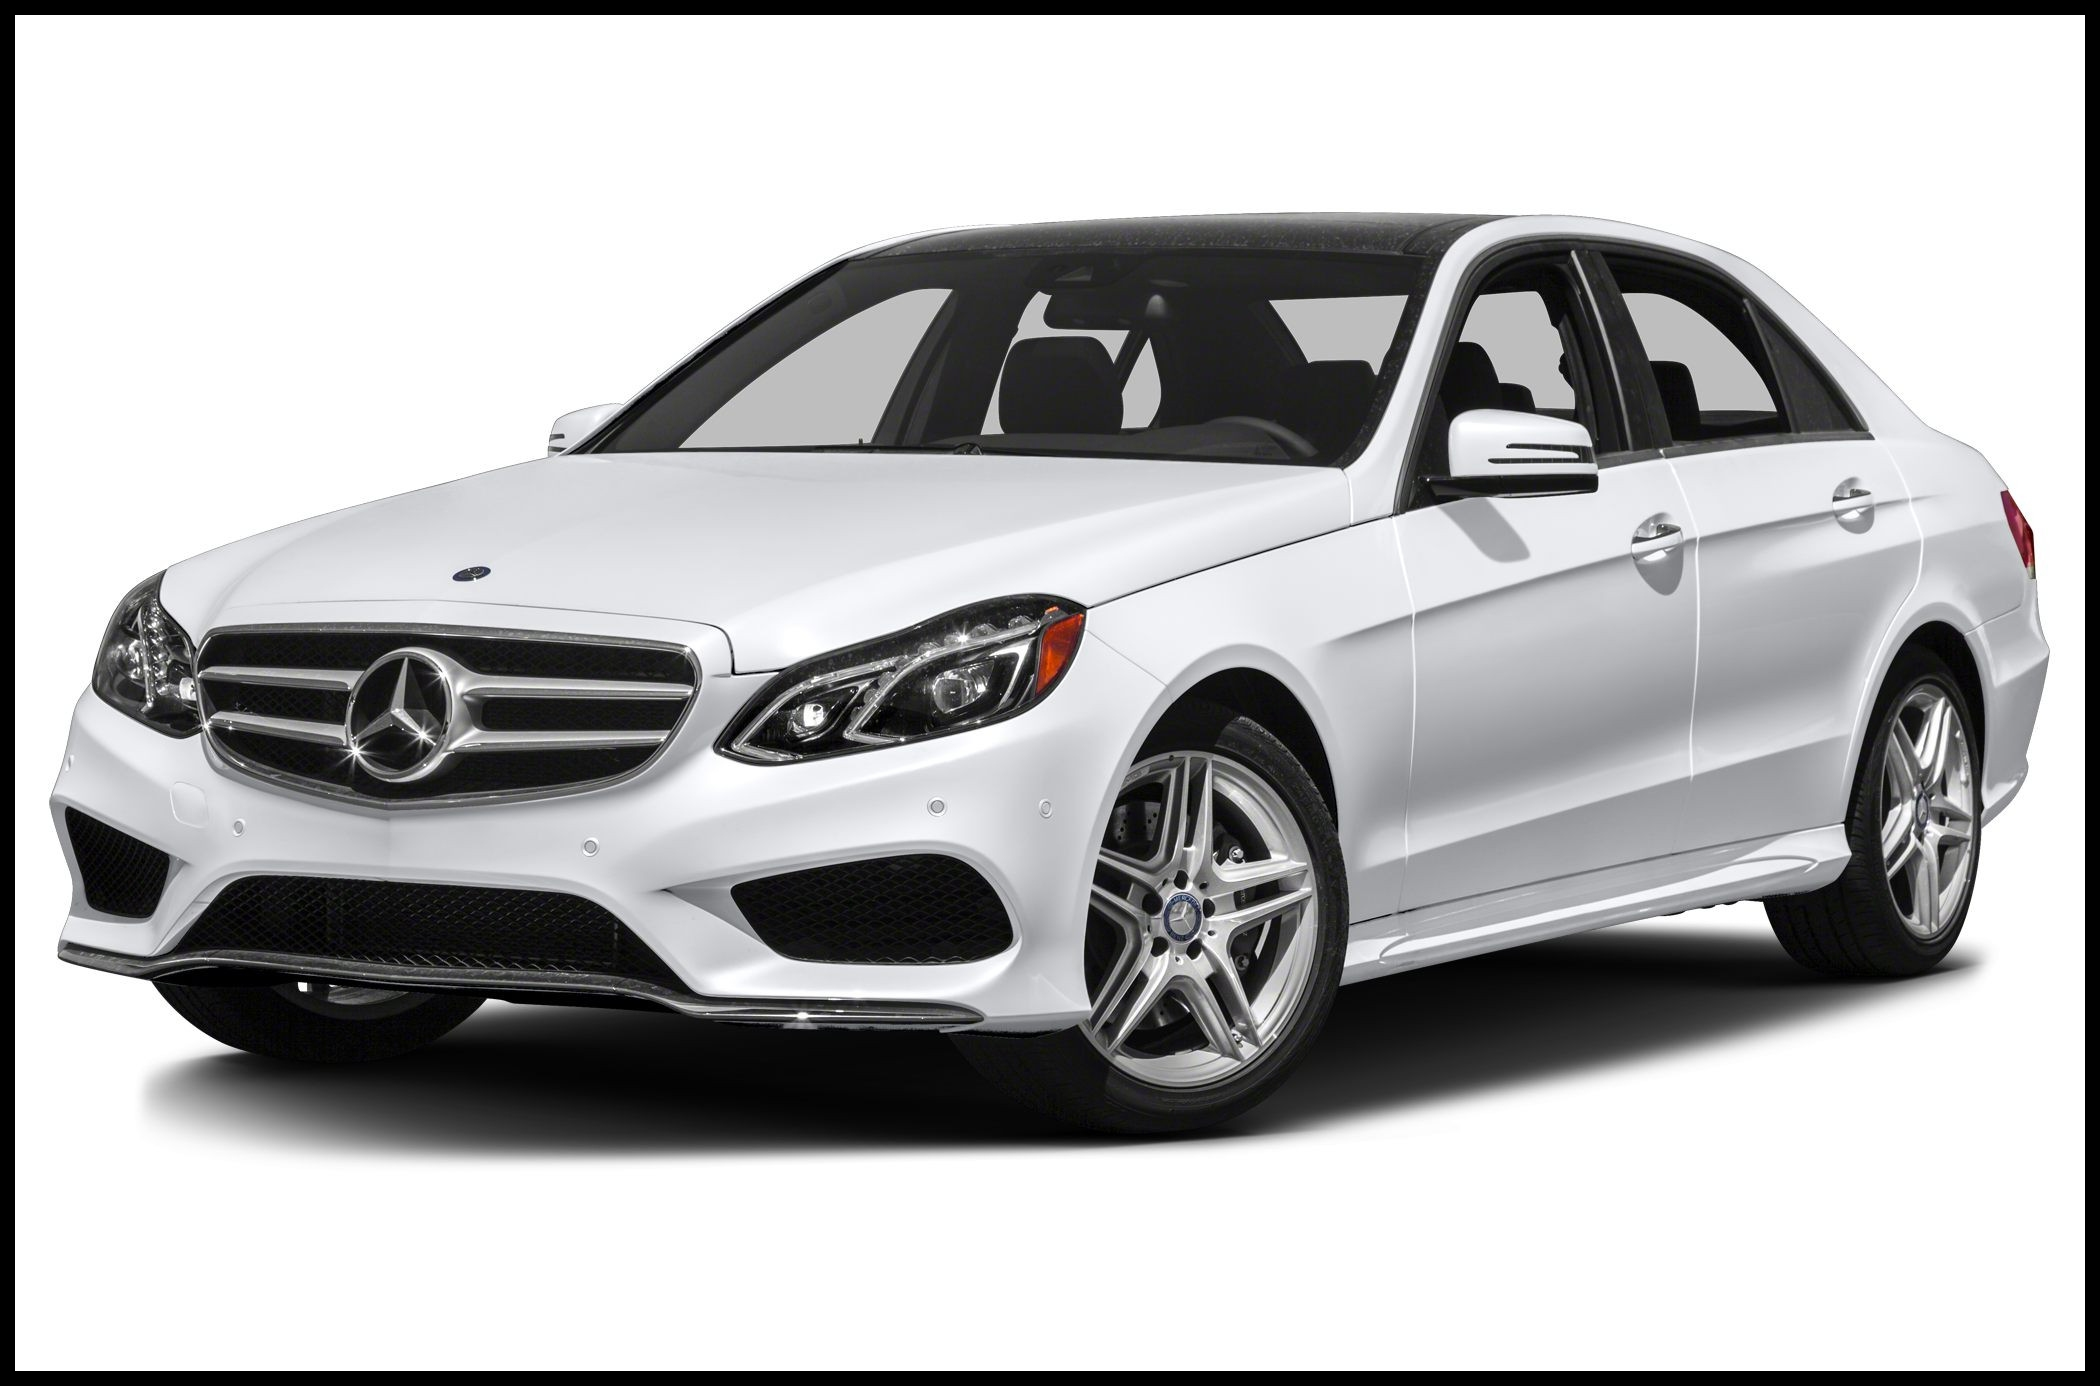 2014 Bmw 535d Review Beautiful 2014 Bmw 535d Vs 2014 Mercedes Benz E Class and 2014